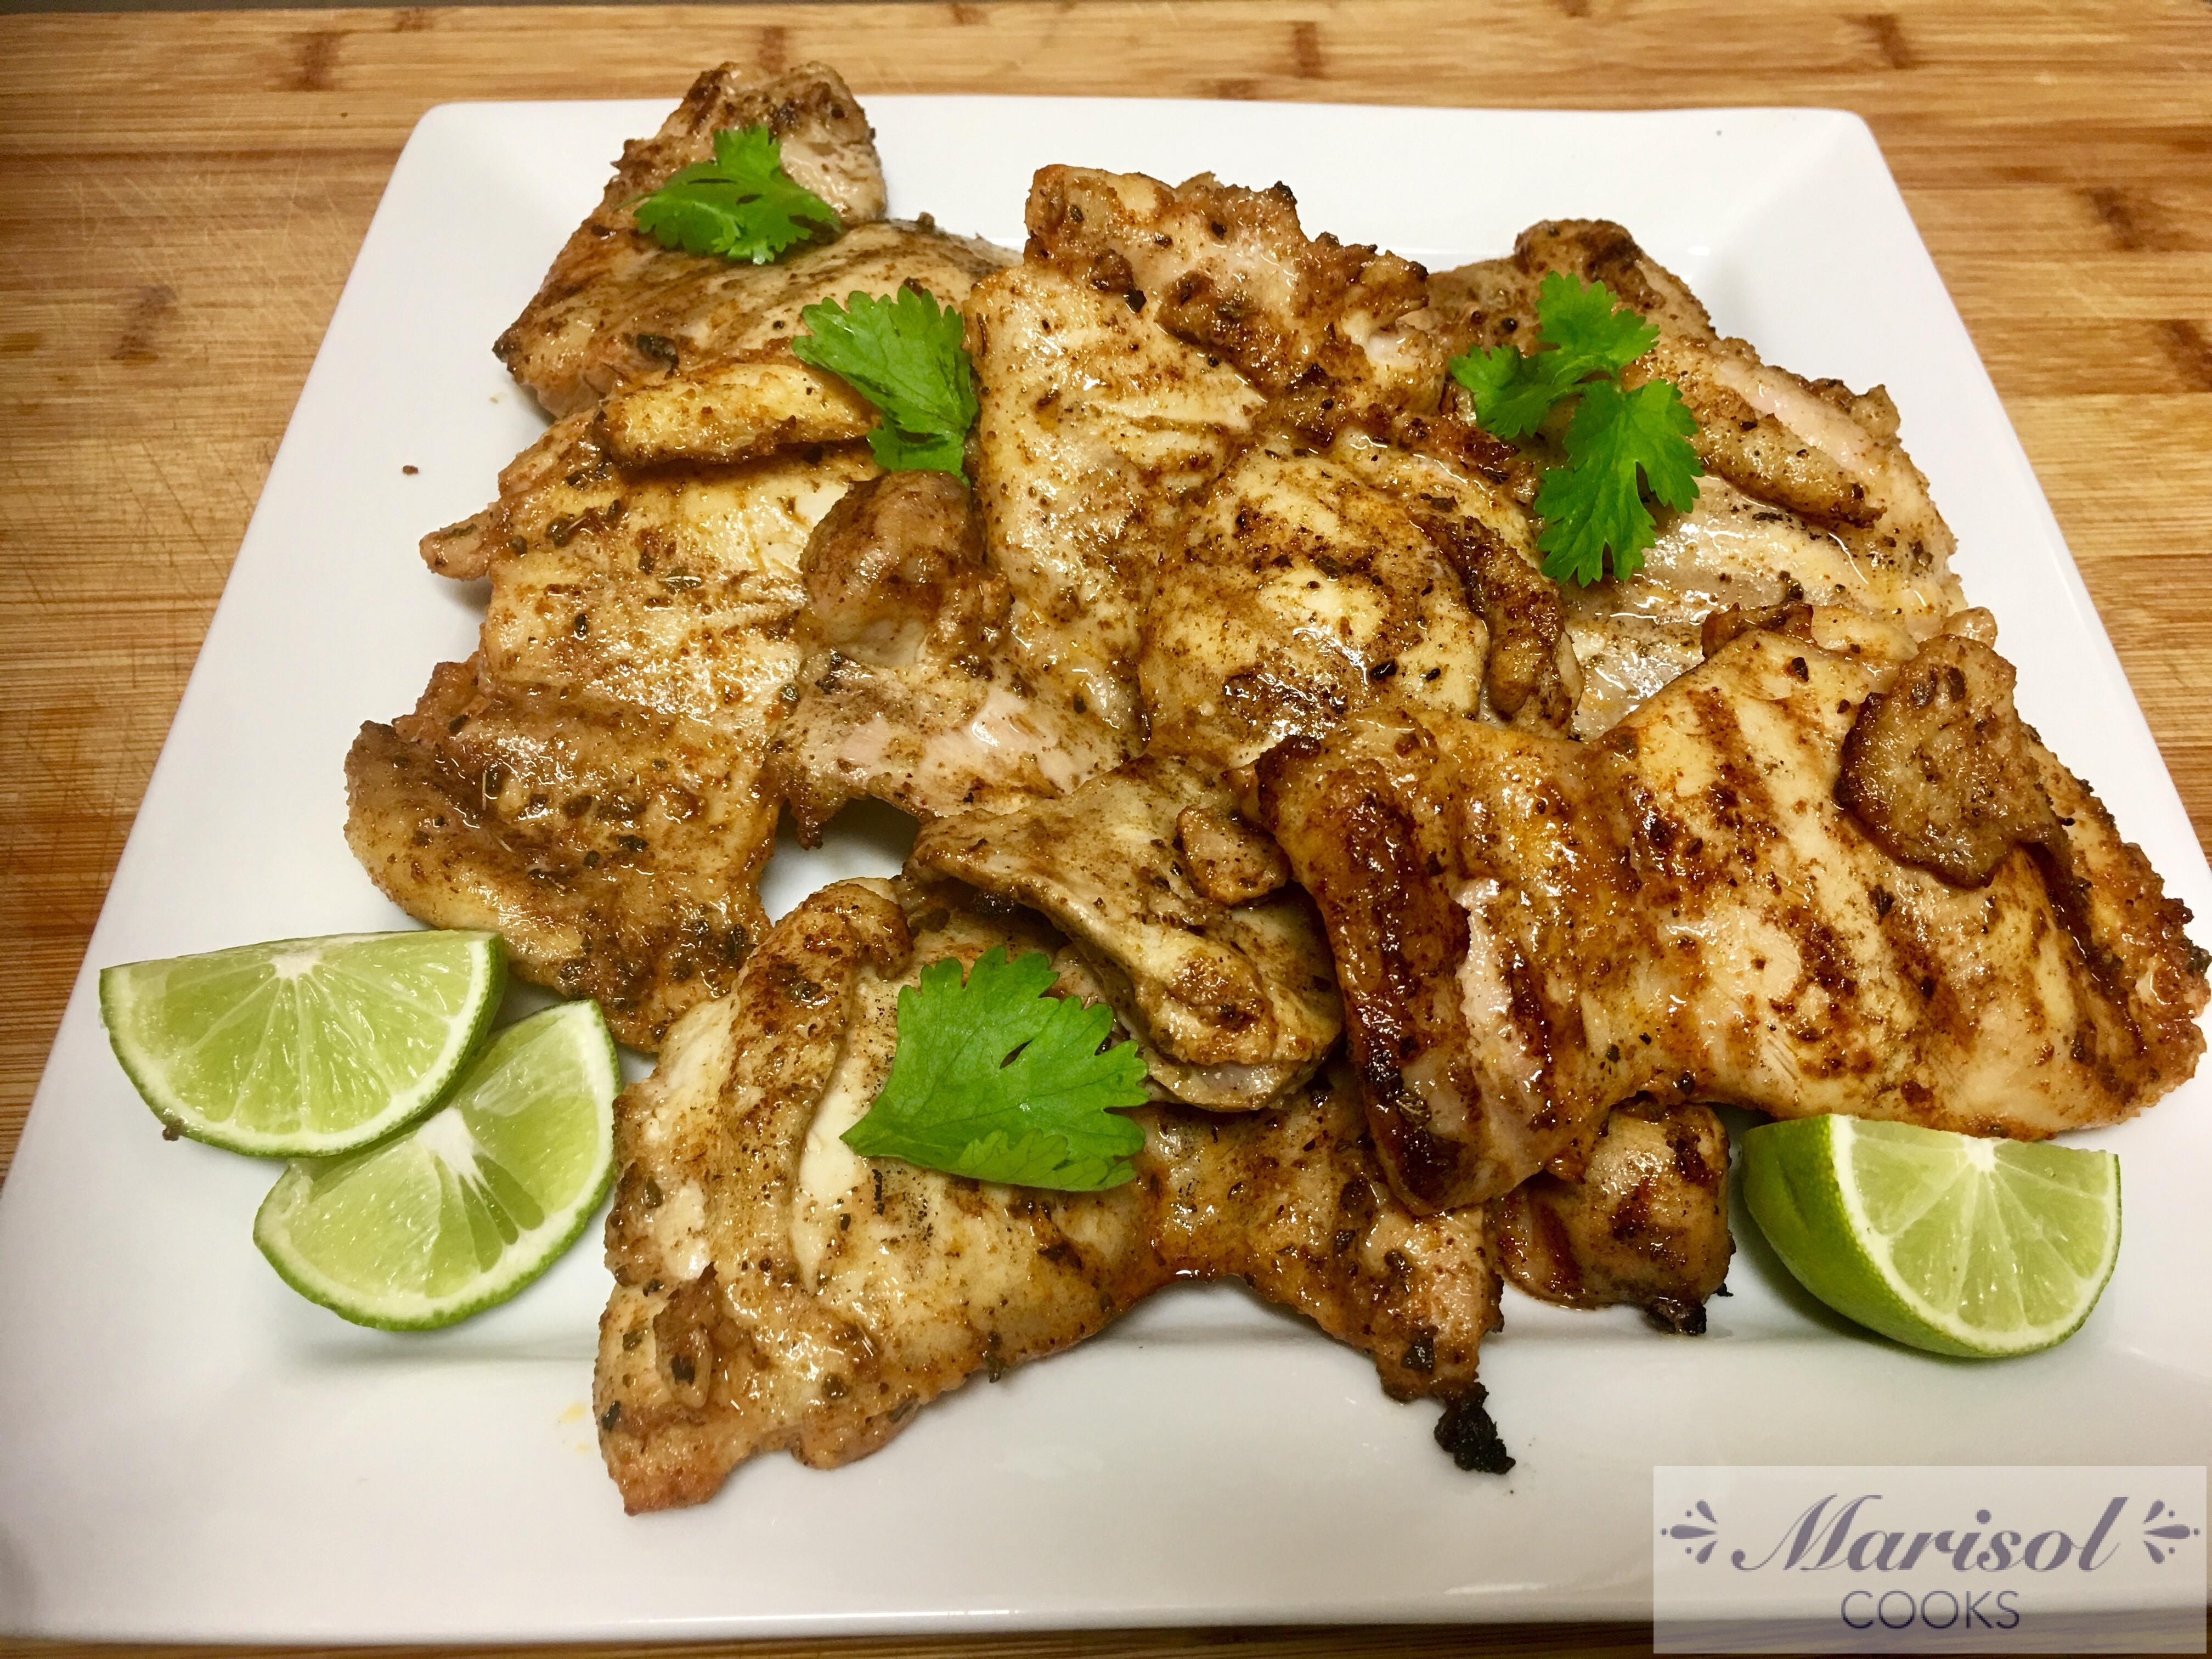 Pollo asado/Grilled chicken